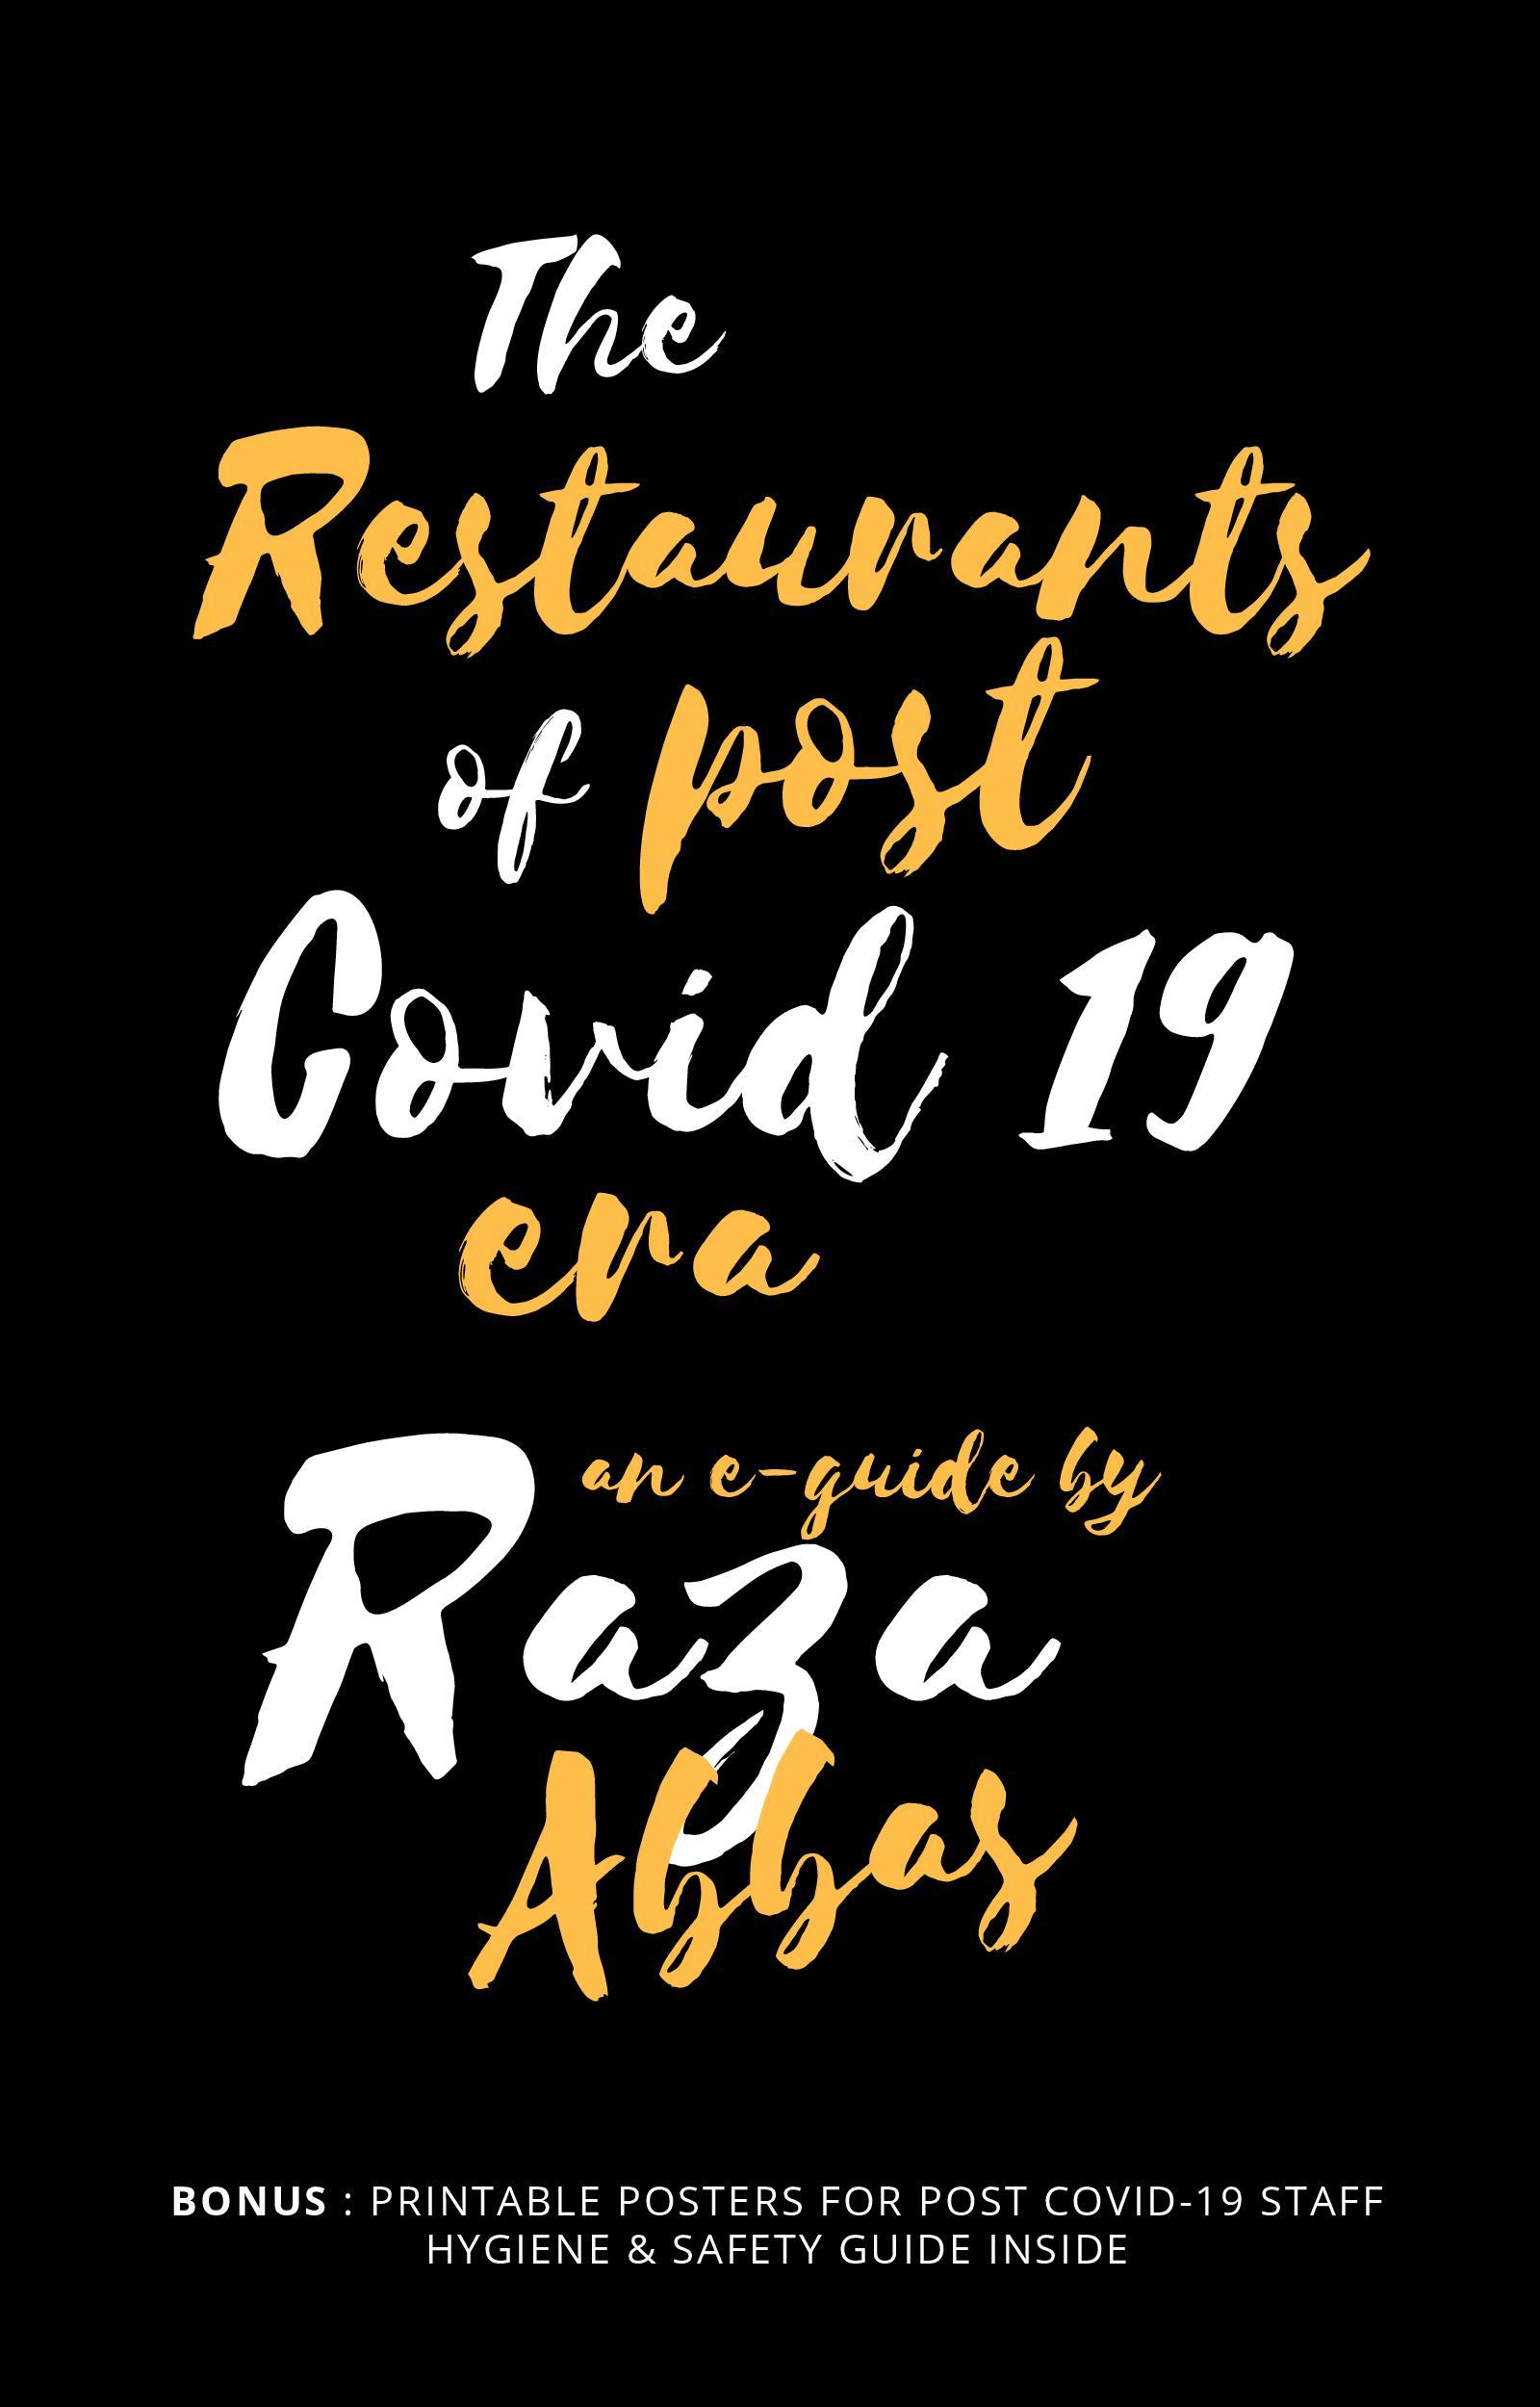 The Restaurants of Post COVID-19 Era